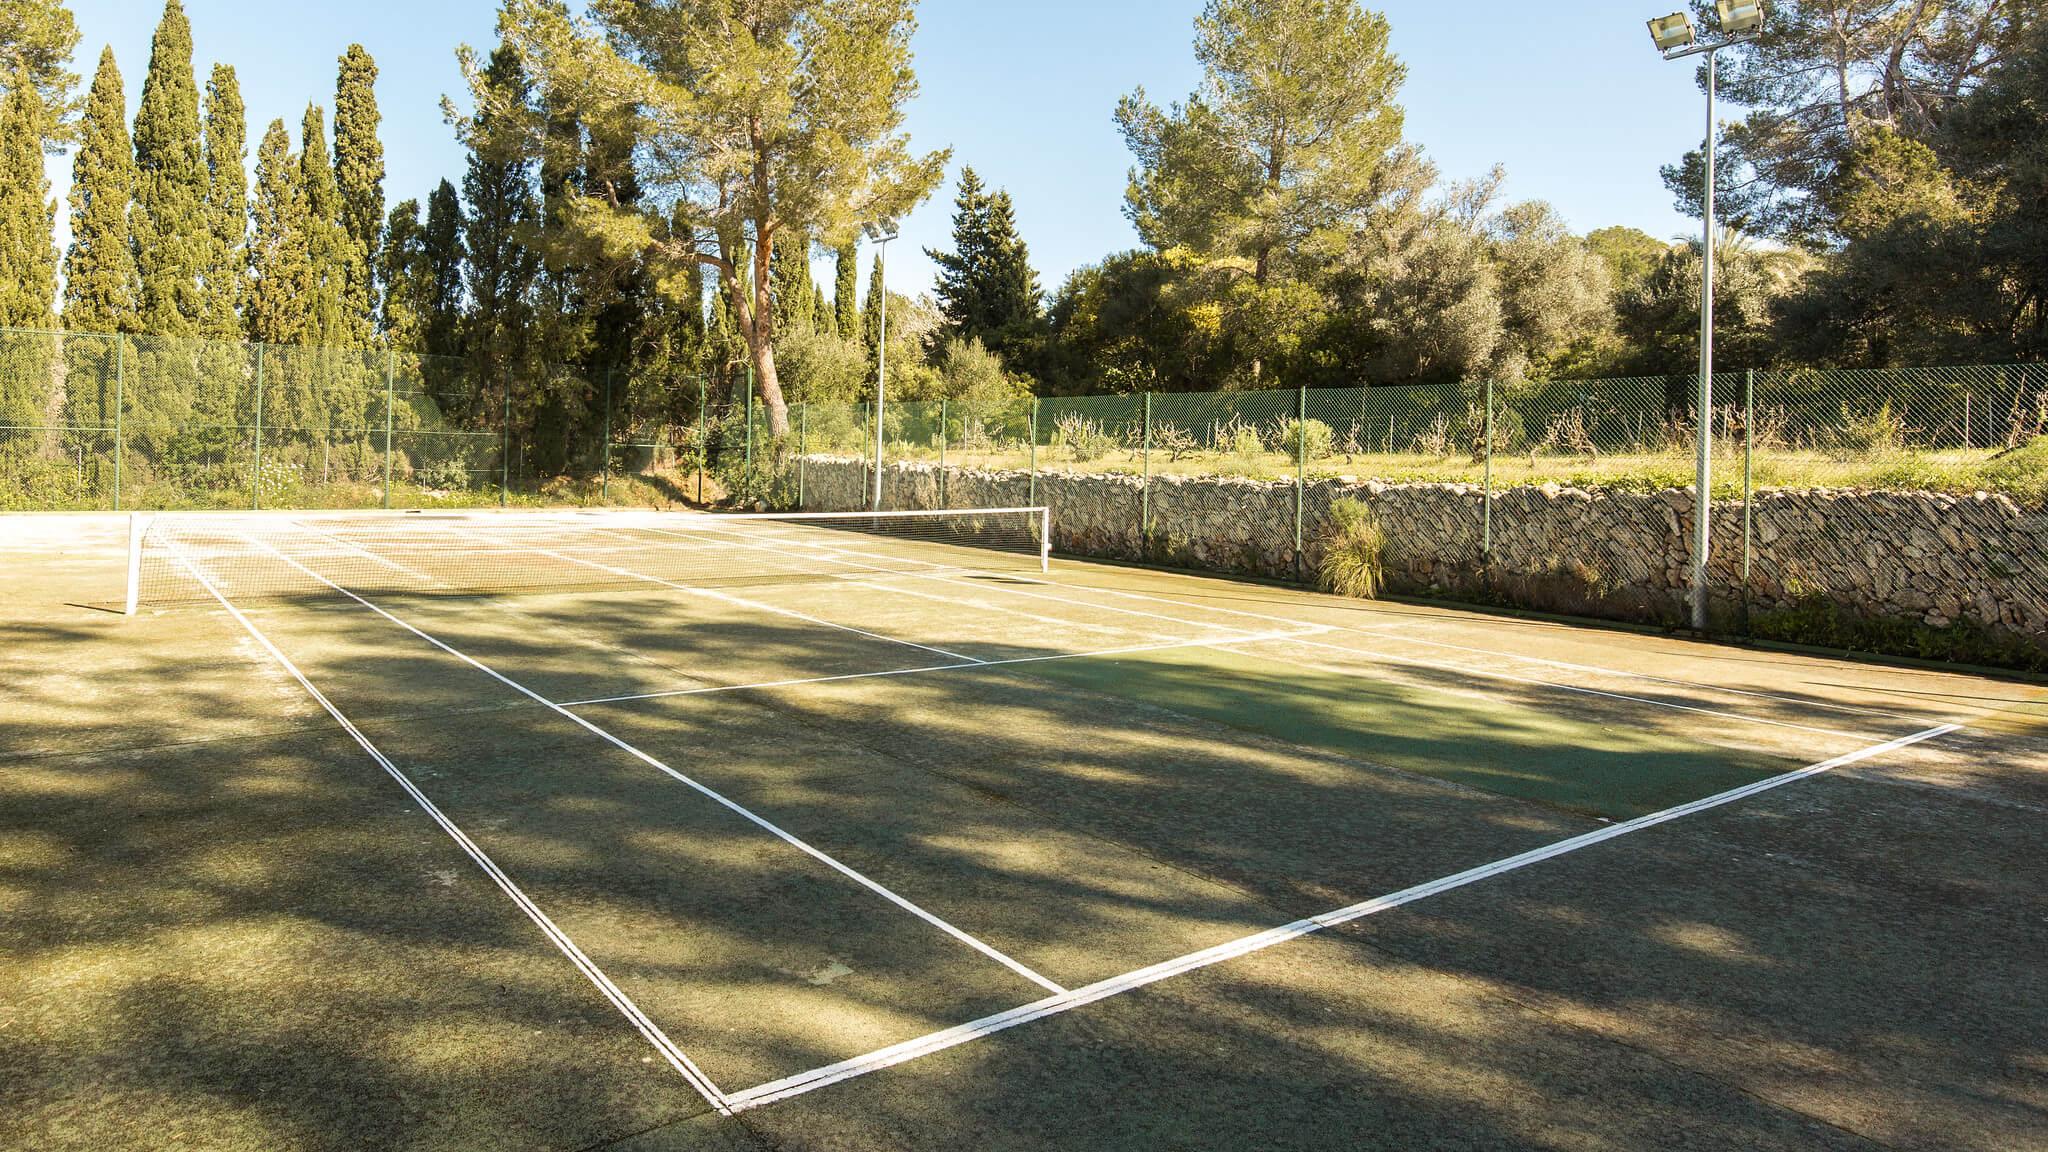 https://www.white-ibiza.com/wp-content/uploads/2020/05/white-ibiza-villas-can-amelida-exterior-tennis-court.jpg